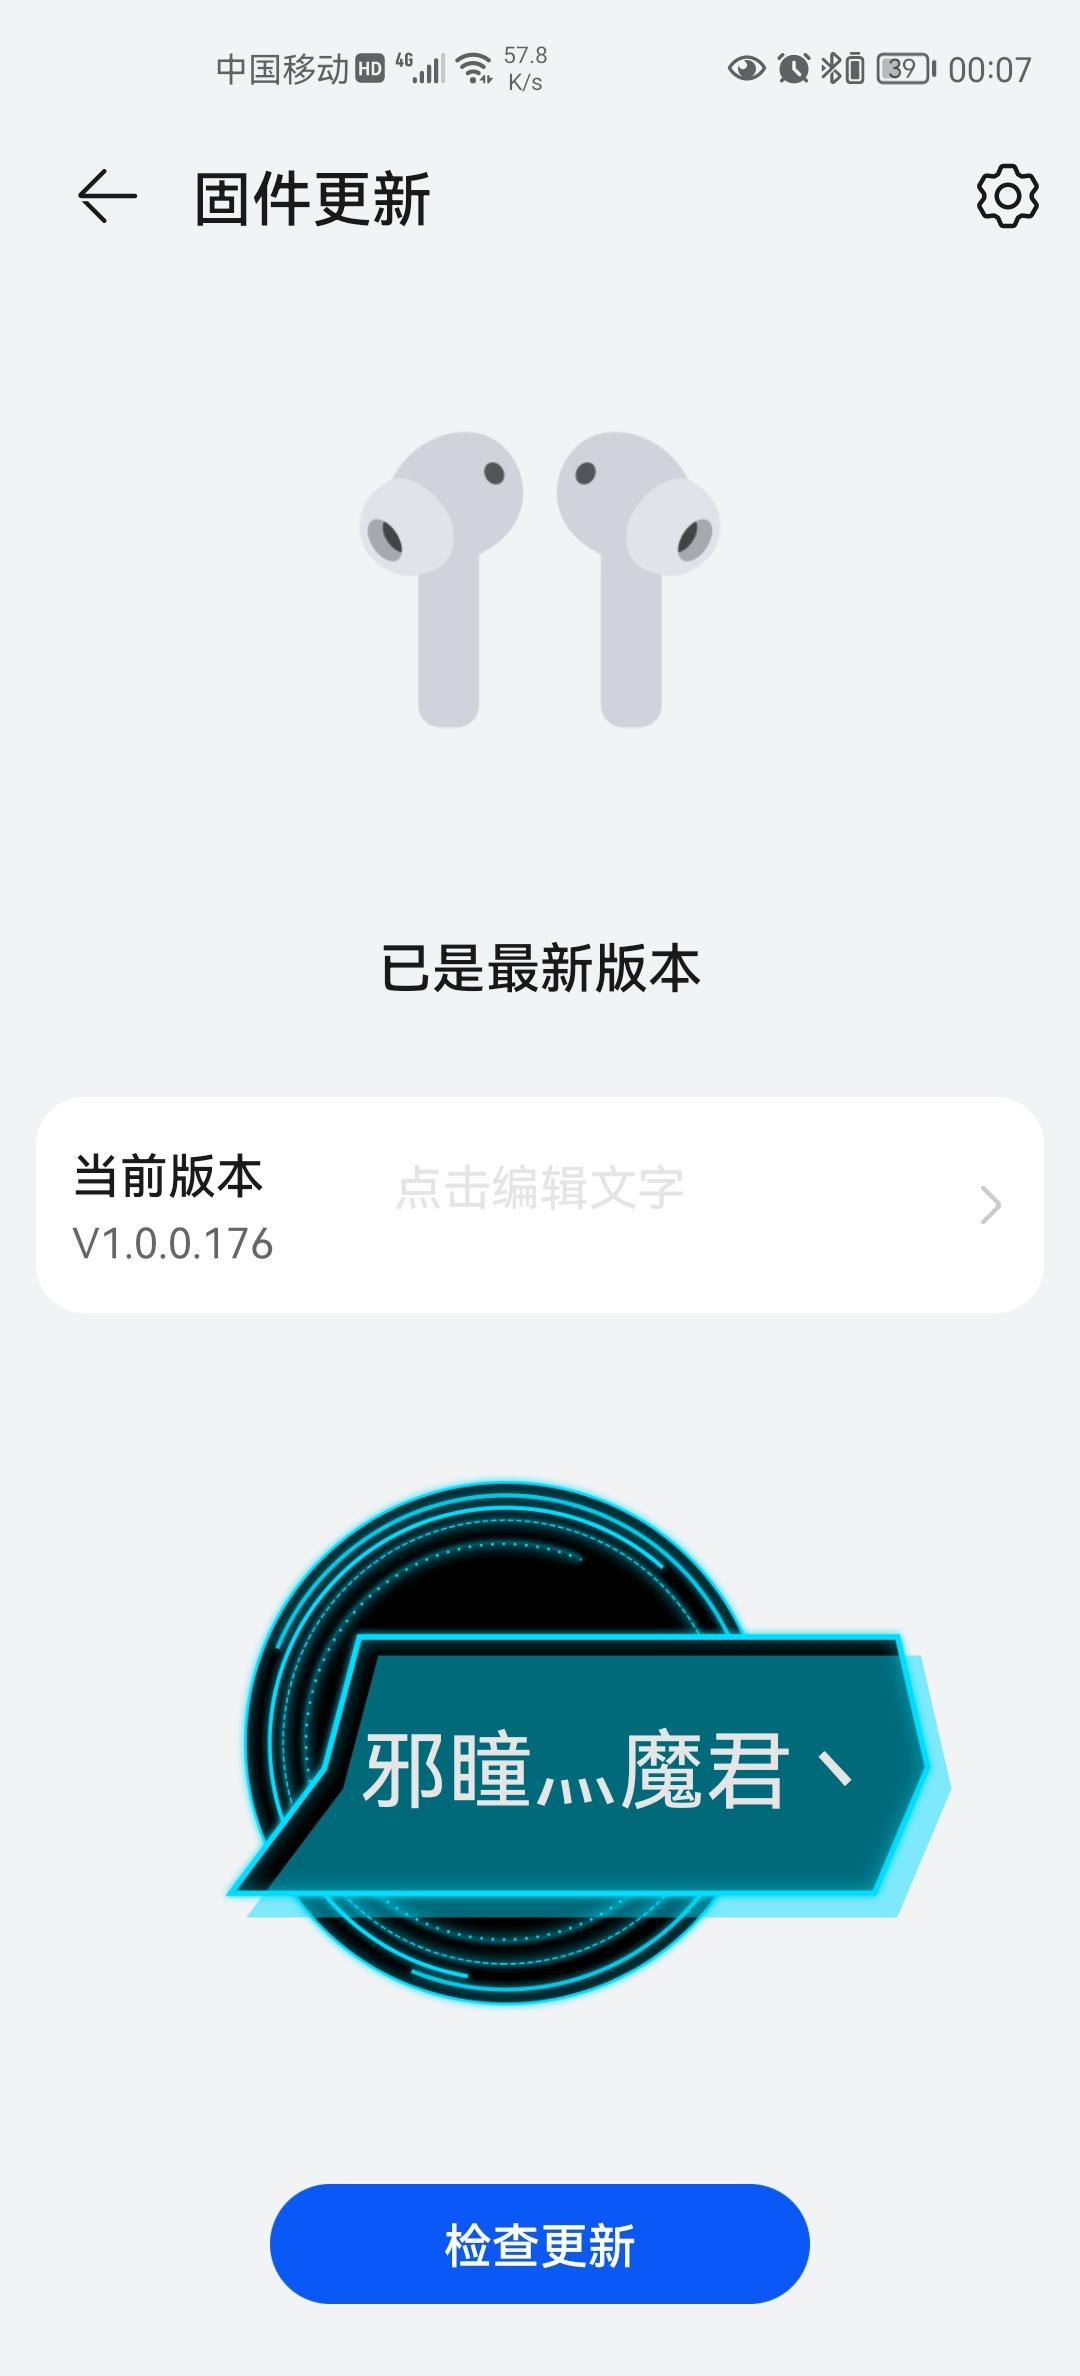 Screenshot_20210706_000746_com.huawei.smarthome_edit_505046050443.jpg